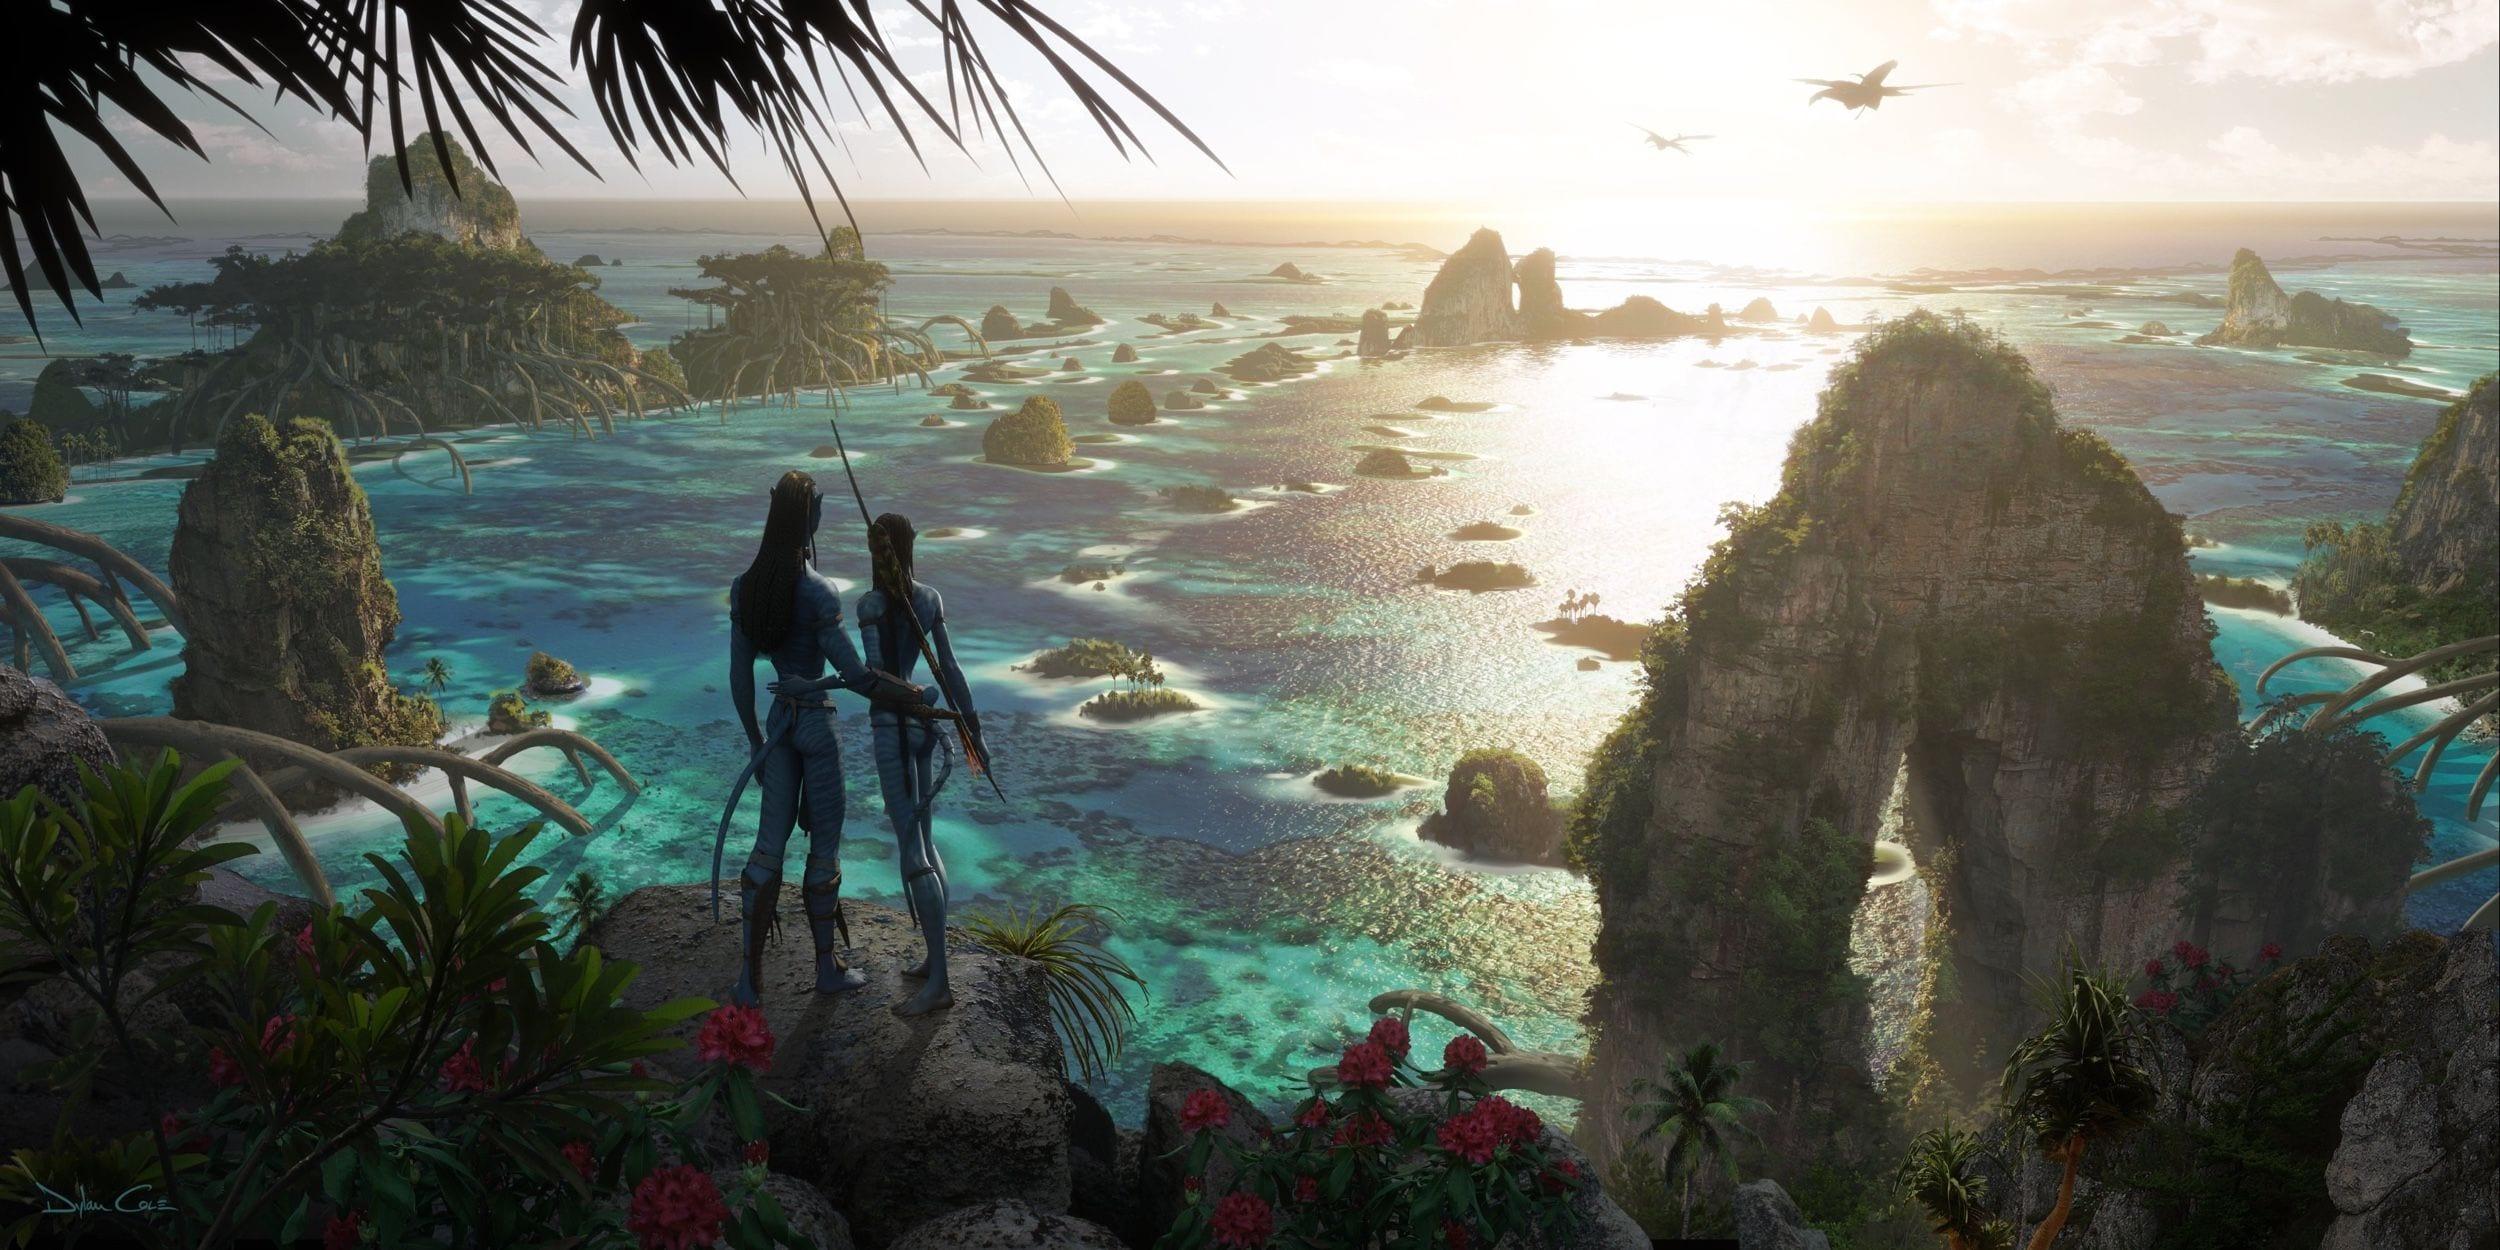 Avatar 2: la concept art mostra i paesaggi acquatici di Pandora